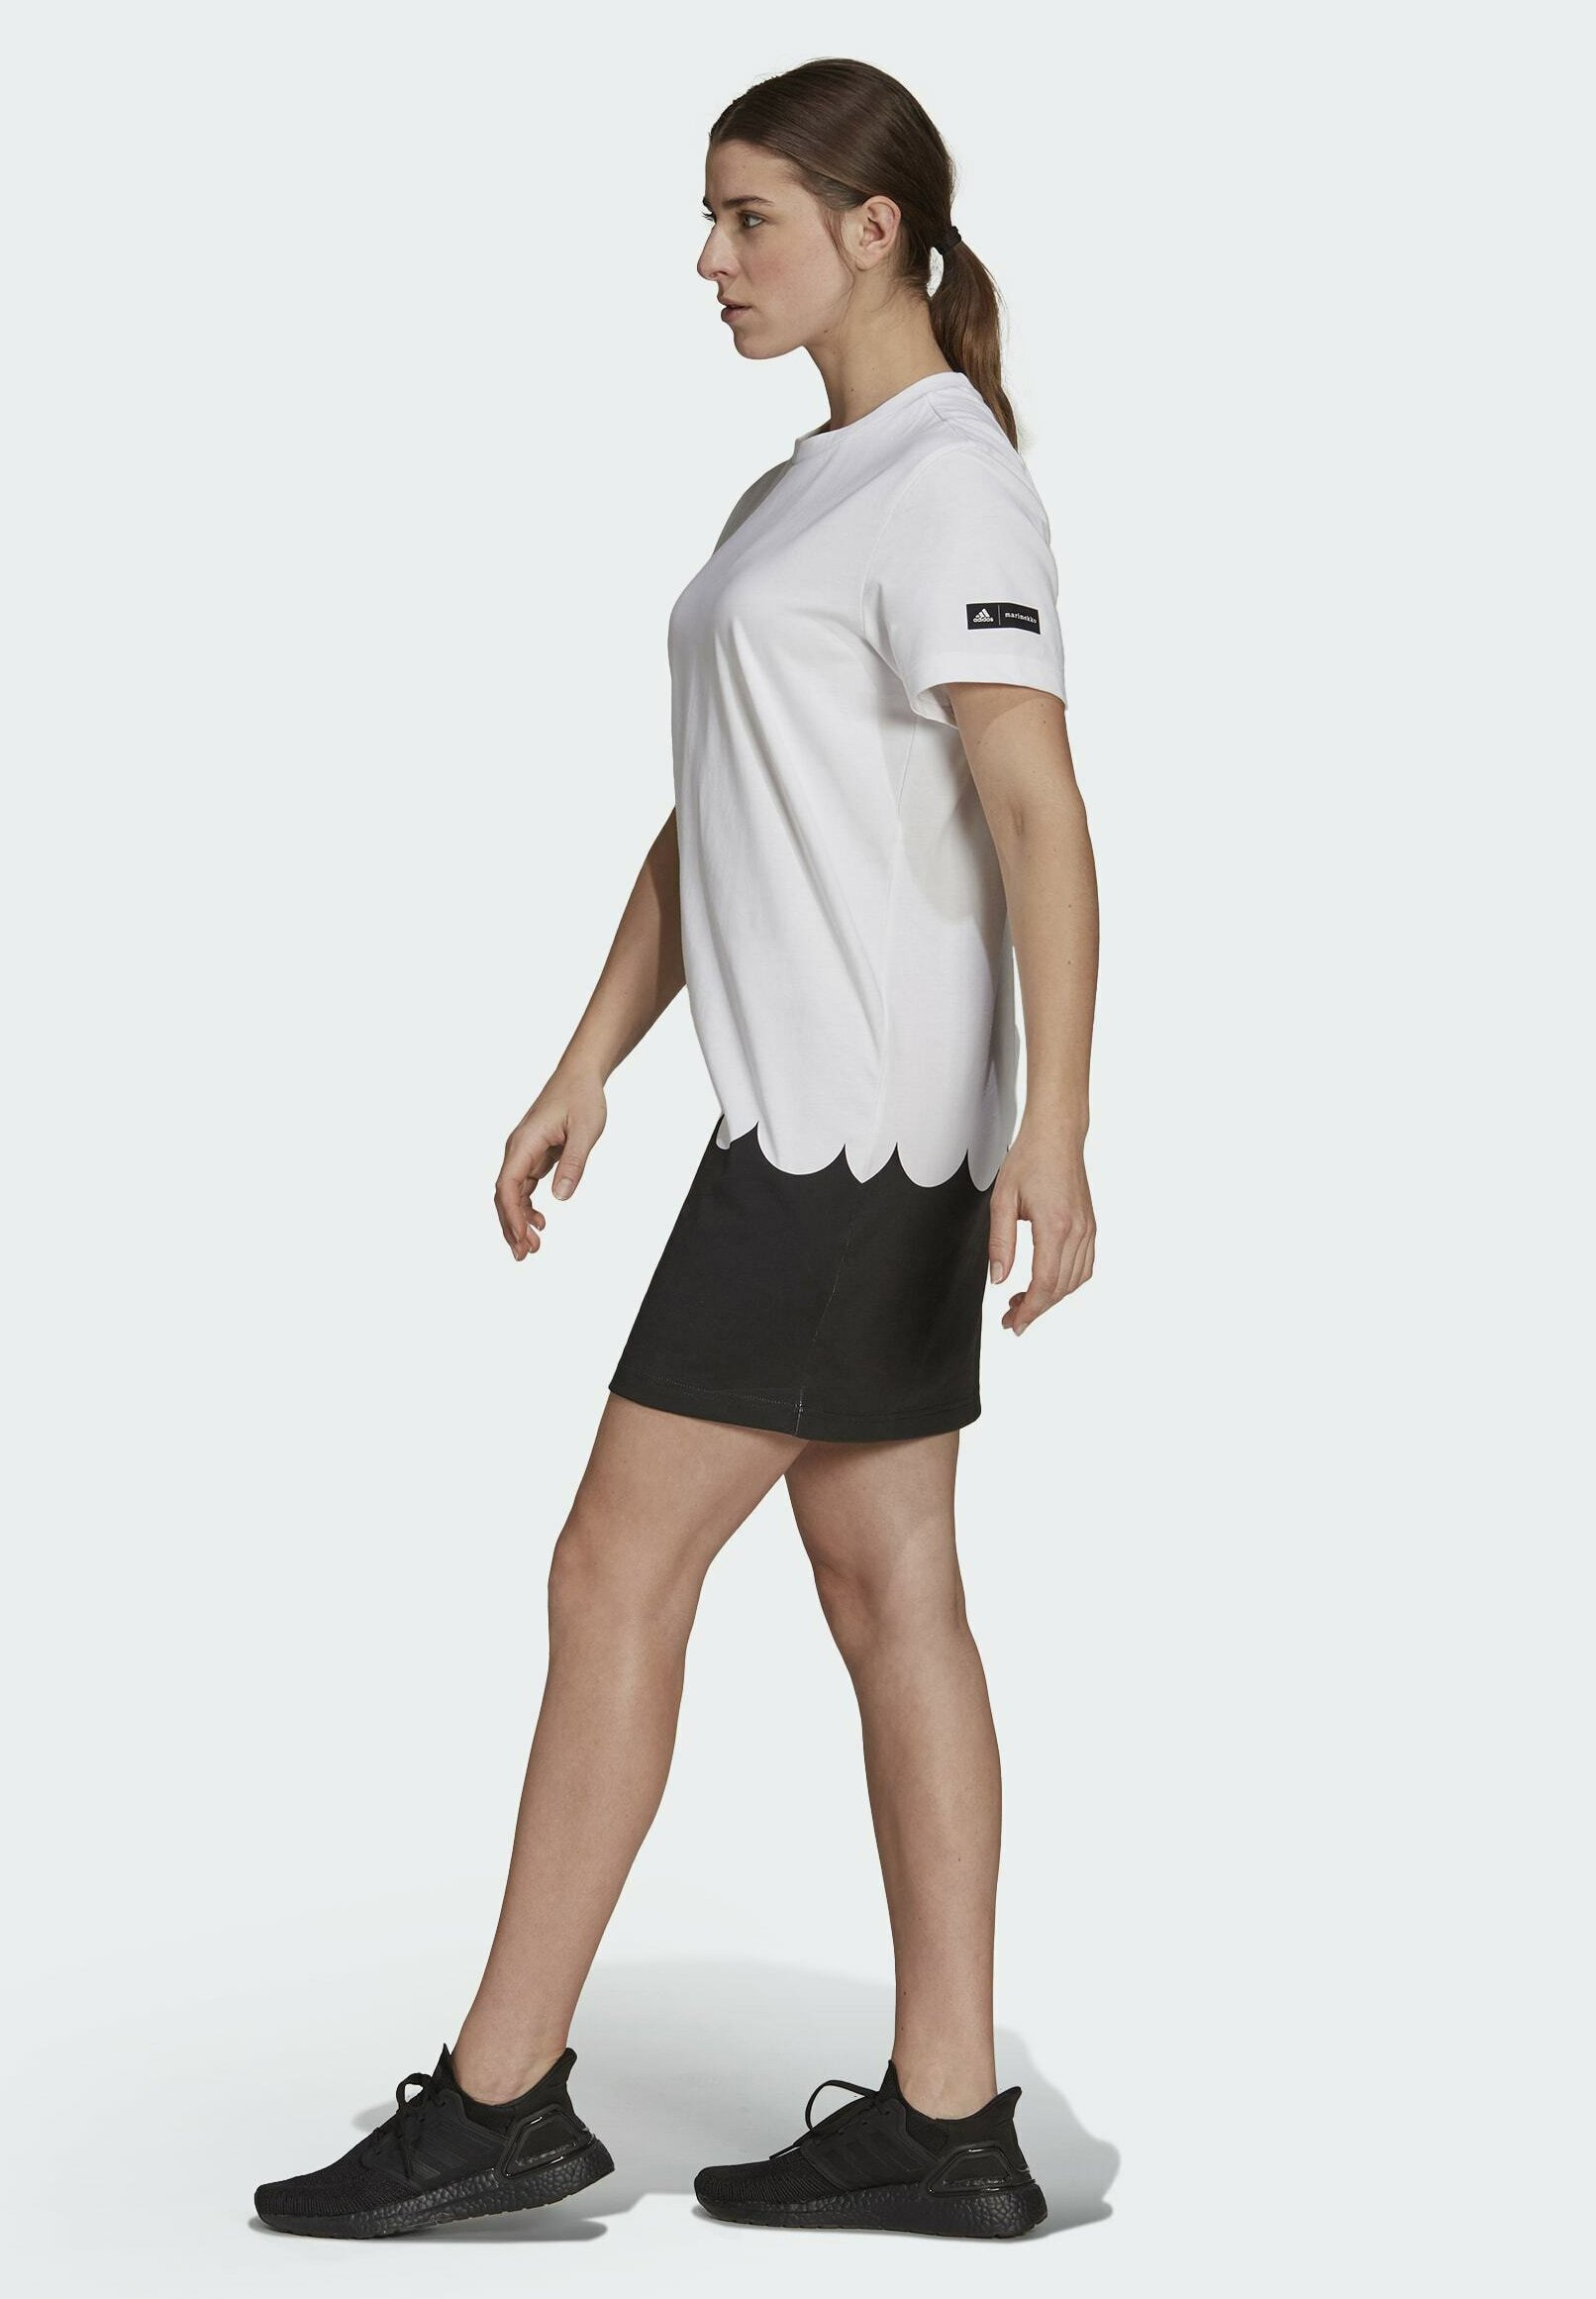 Donna MARIMEKKO - Abbigliamento sportivo